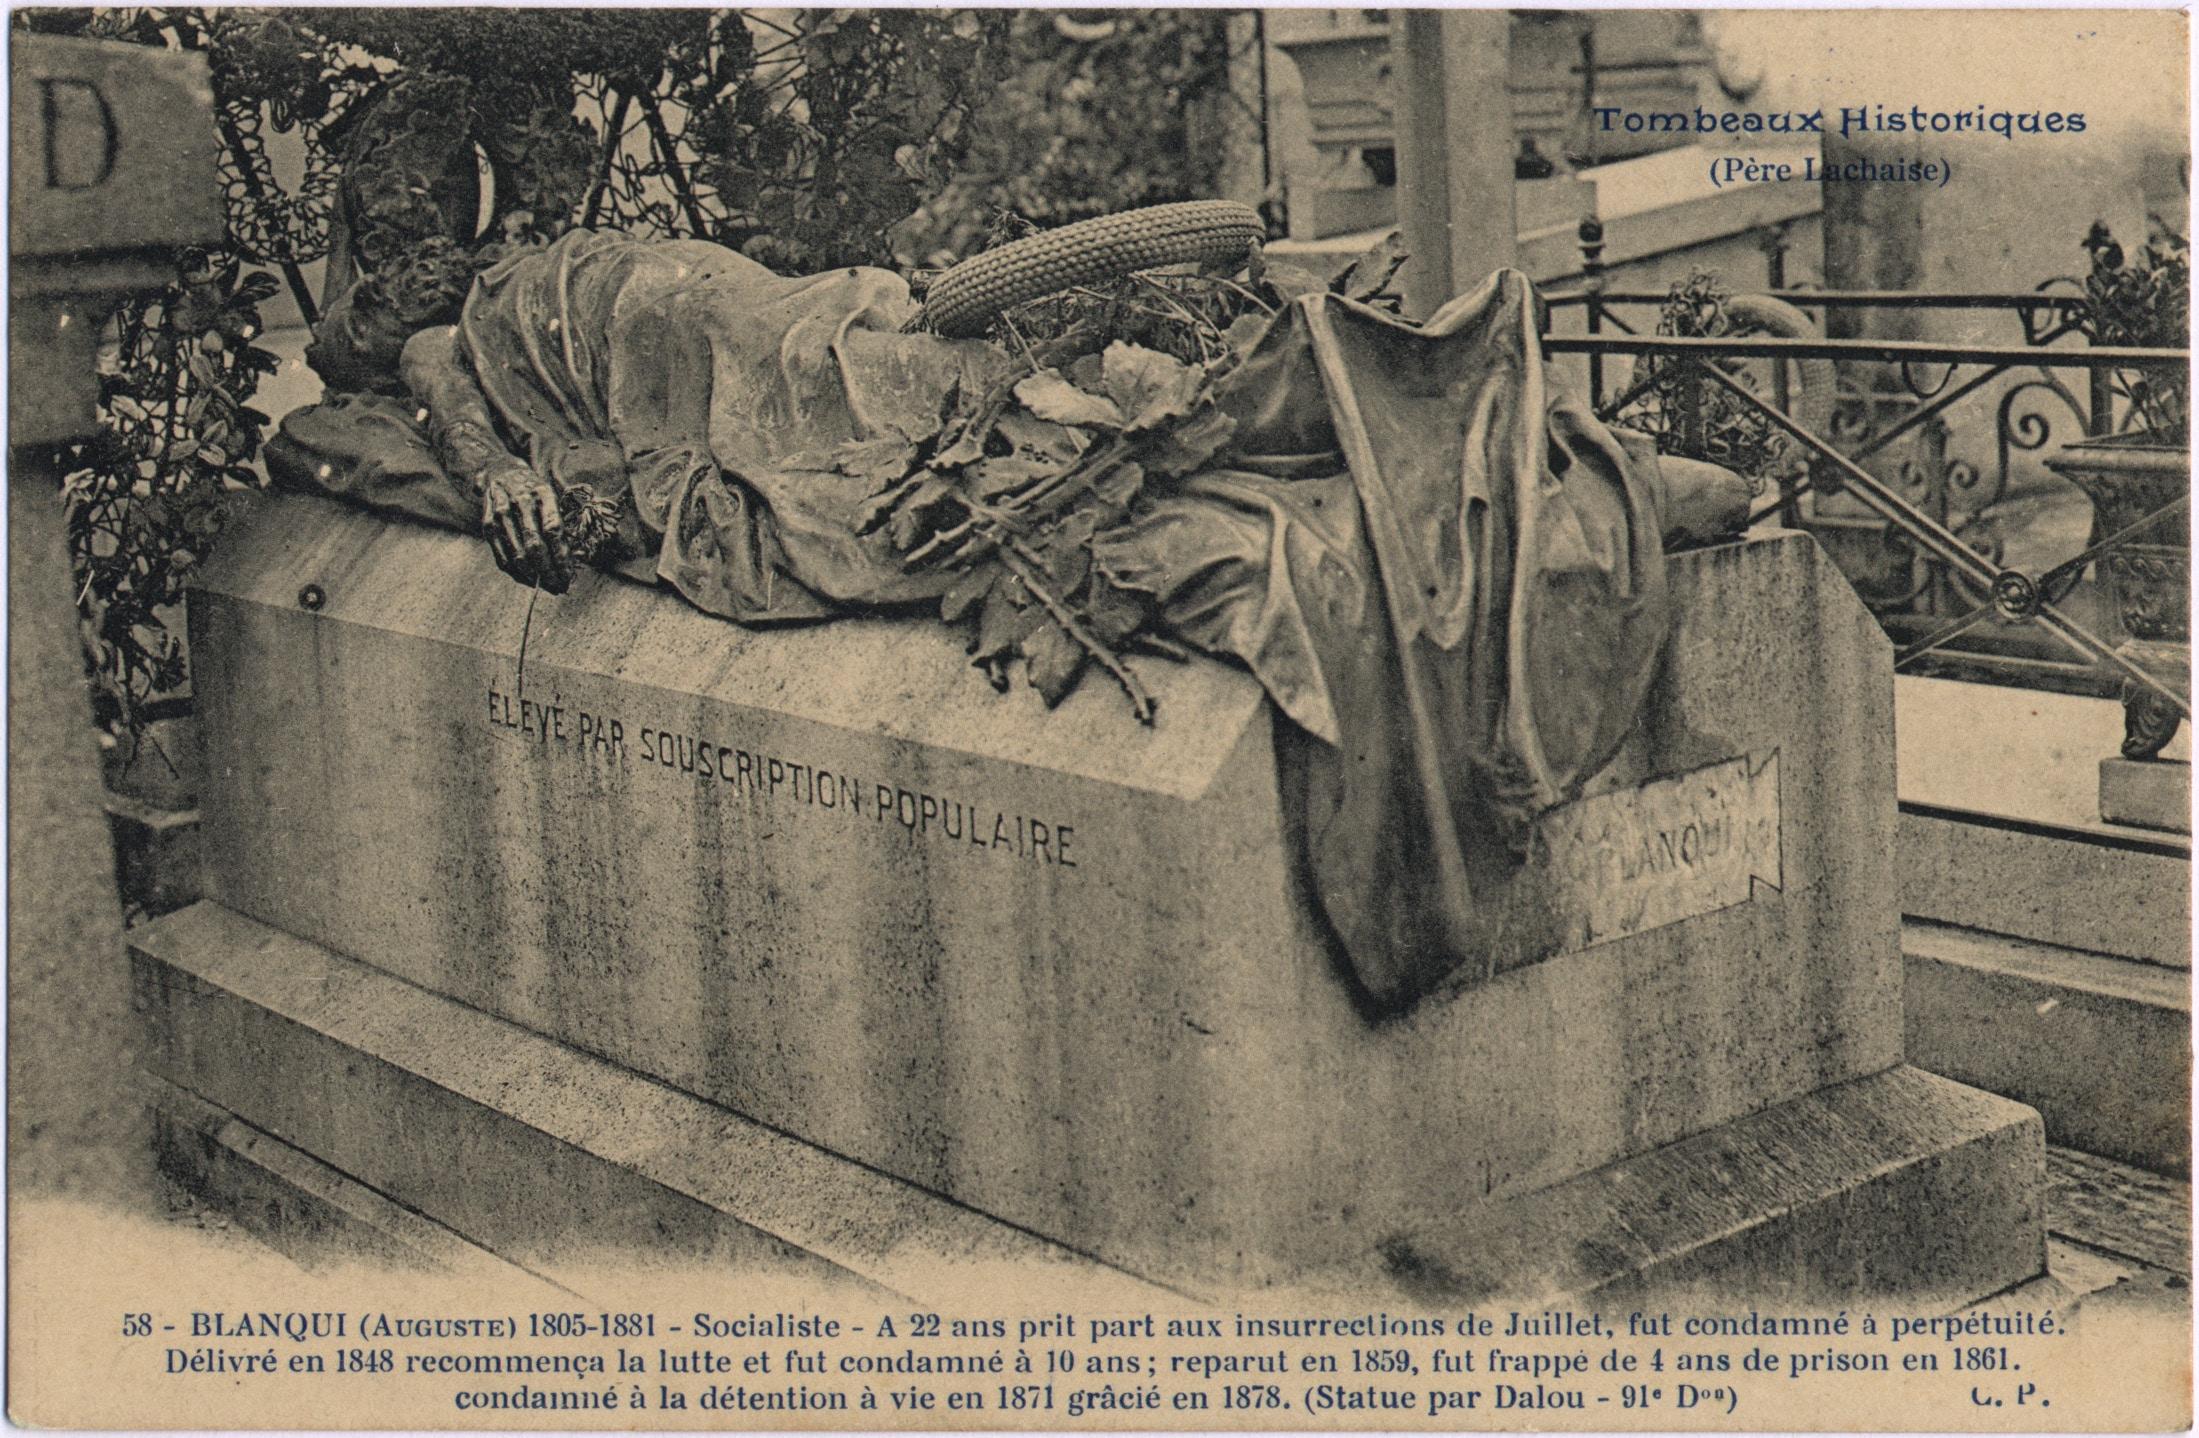 Auguste Blanqui's grave (1805-1881) by Jules Dalou (1838–1902), sculptor, at the Père Lachaise cemetery in Paris (1885). From a postcard circa 1900. Photo: Unknown. Public Domain.